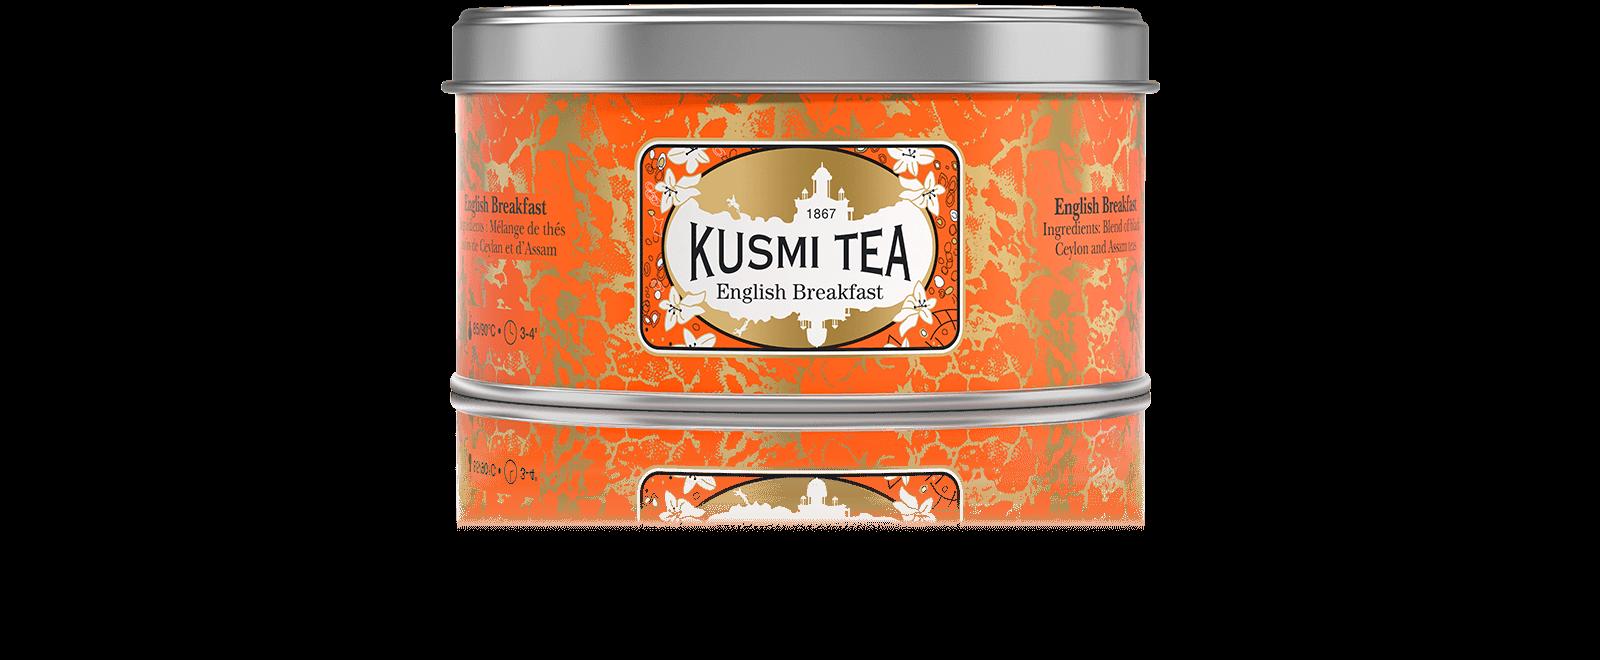 English Breakfast - Thé noir de Ceylan, Assam - Kusmi Tea